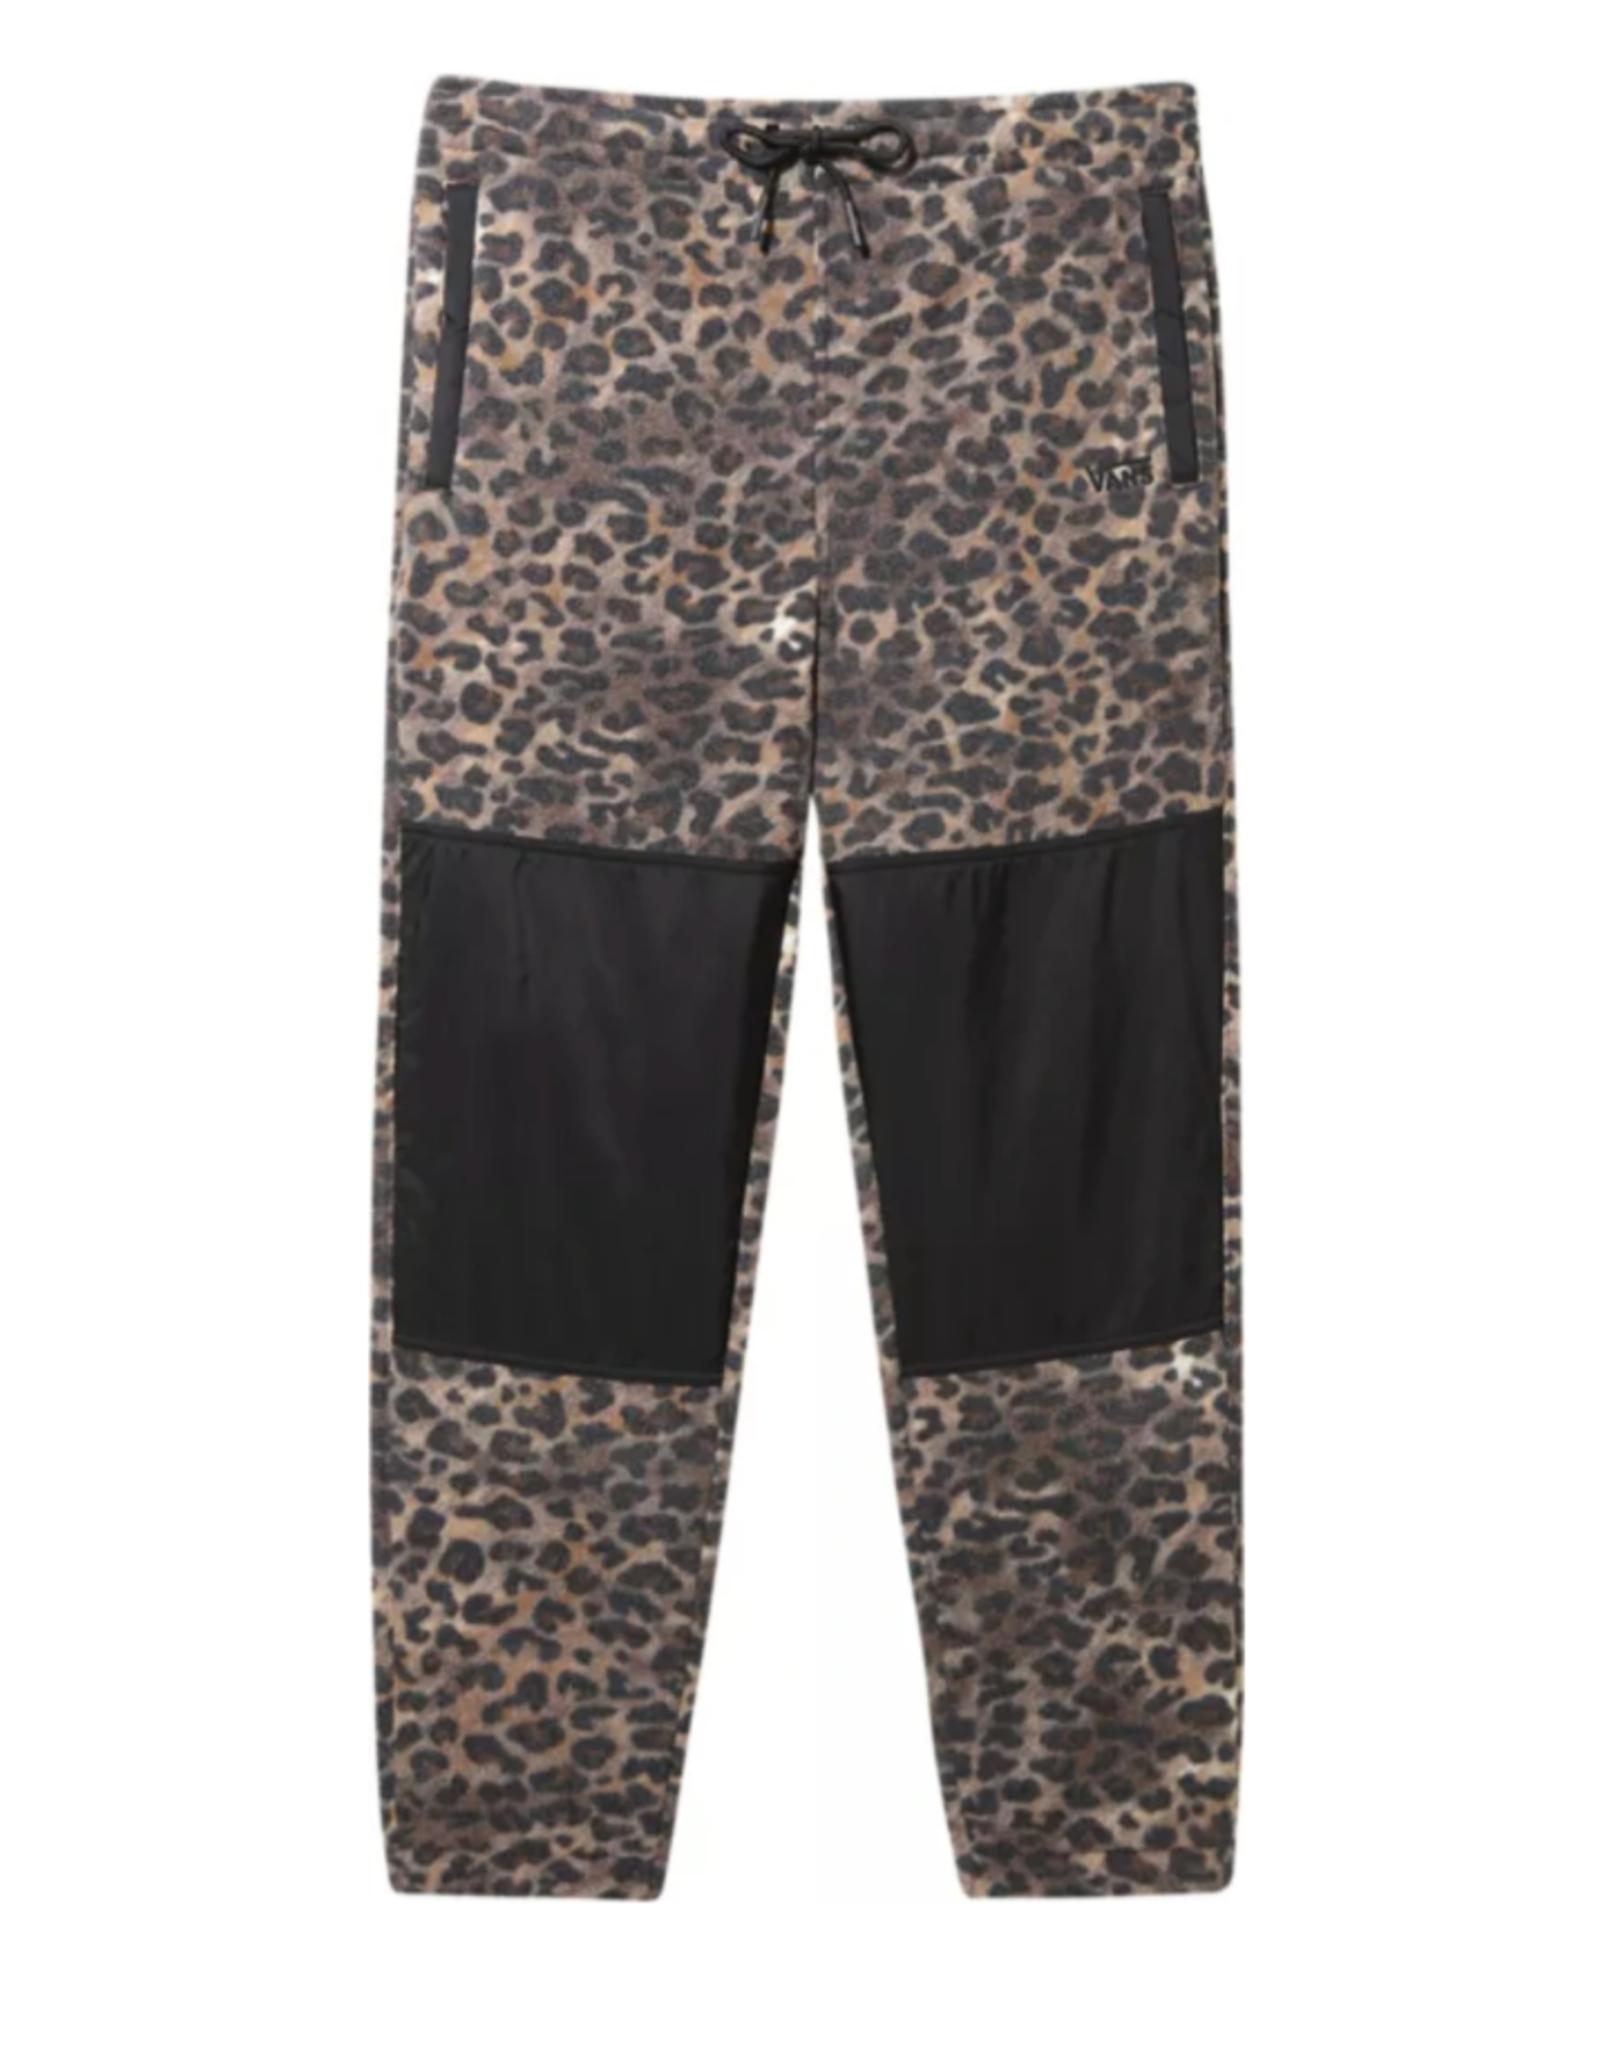 Vans Vans M POLAR FLEECE PANT Leopard